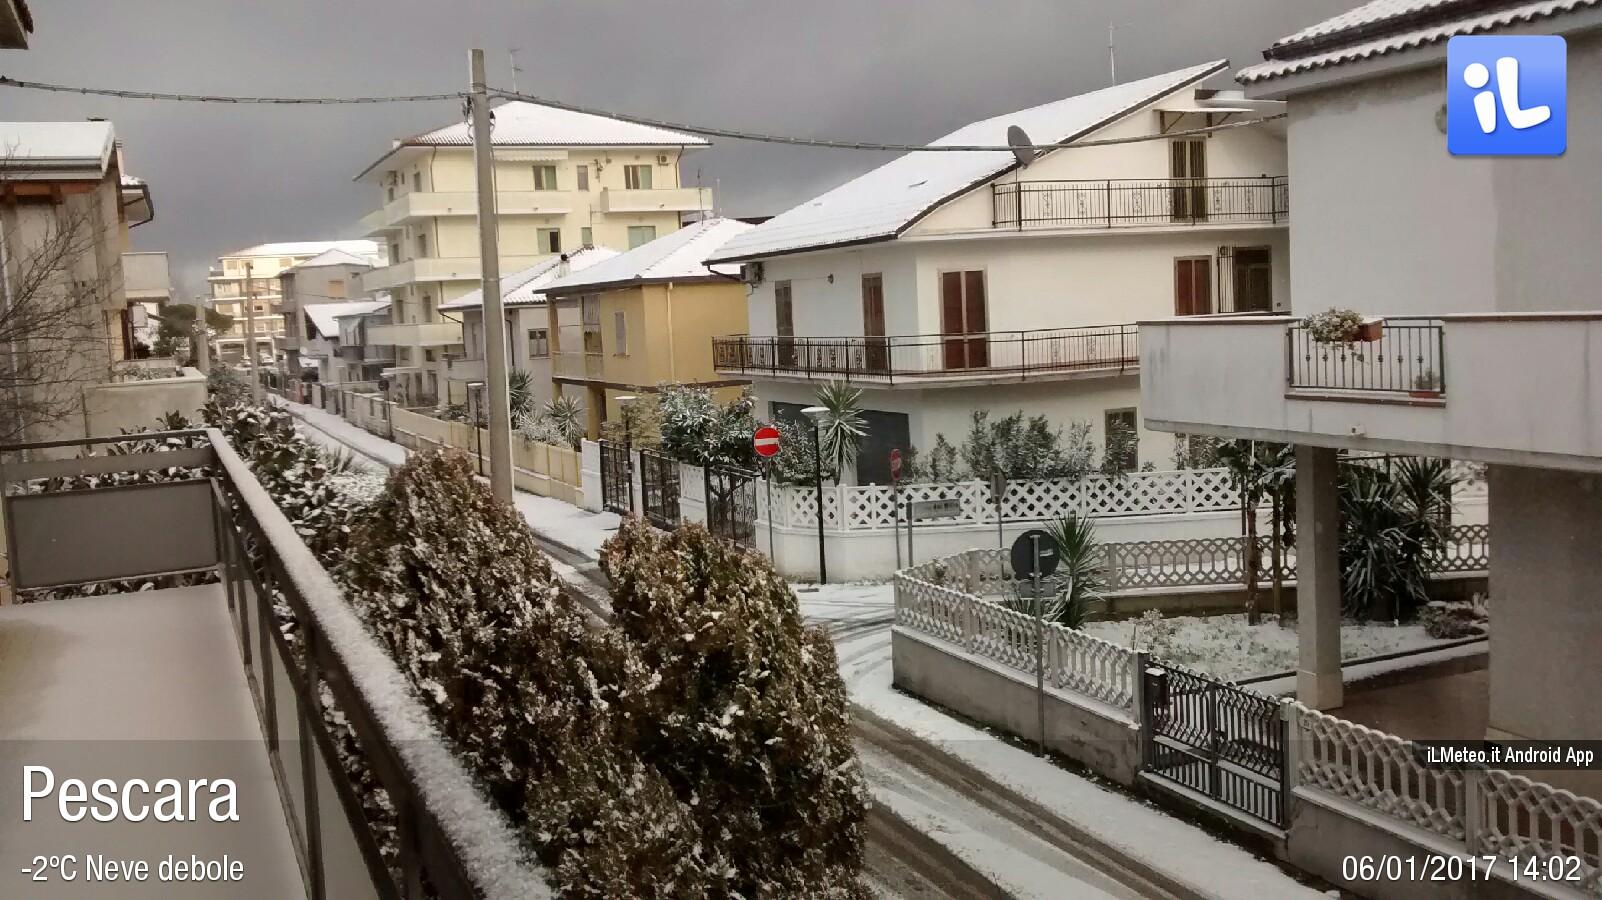 Foto meteo - Pescara - Pescara ore 14:02 » ILMETEO.it